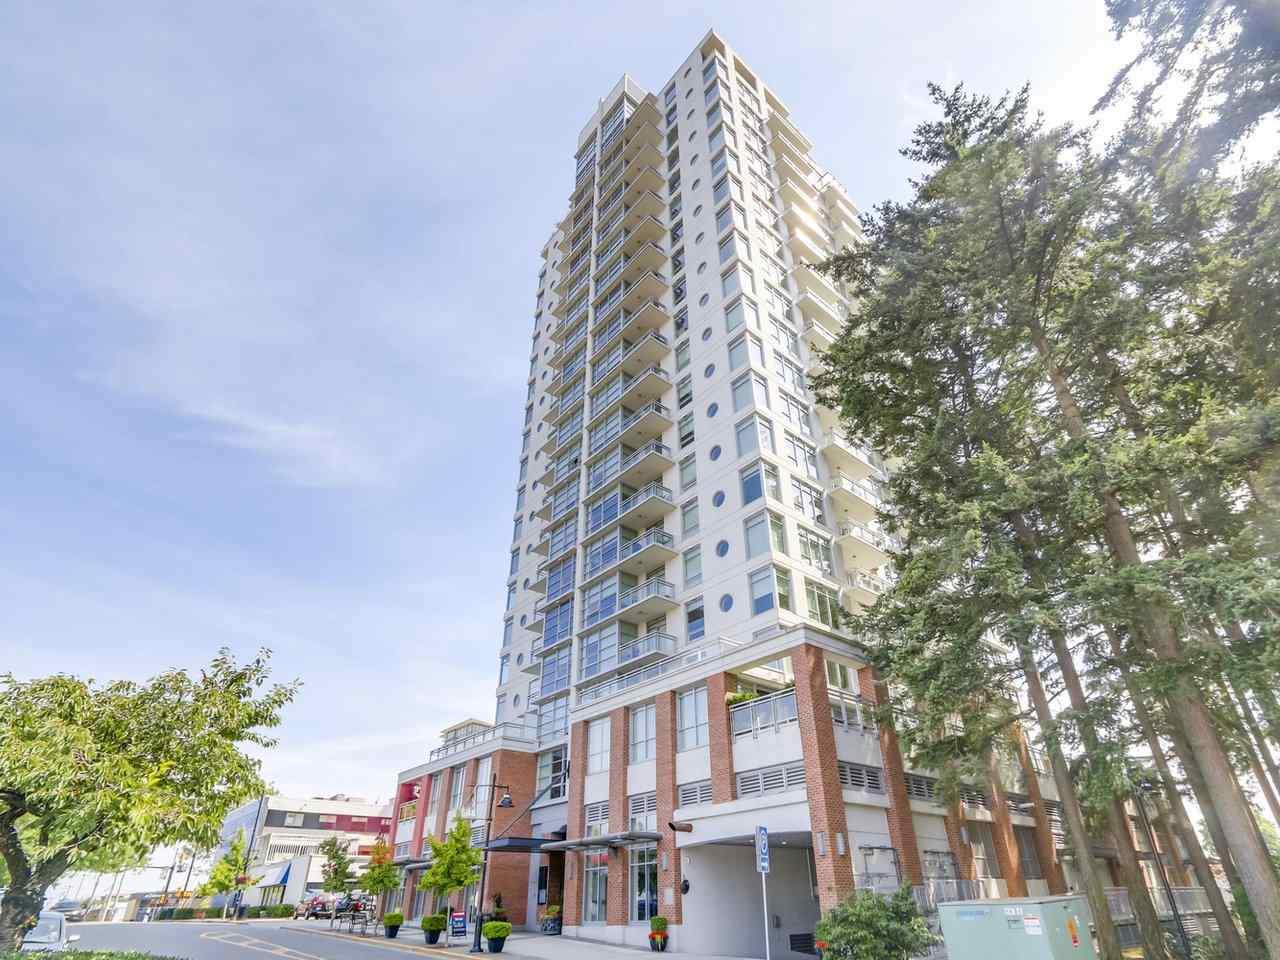 Condo Apartment at 802 15152 RUSSELL AVENUE, Unit 802, South Surrey White Rock, British Columbia. Image 1